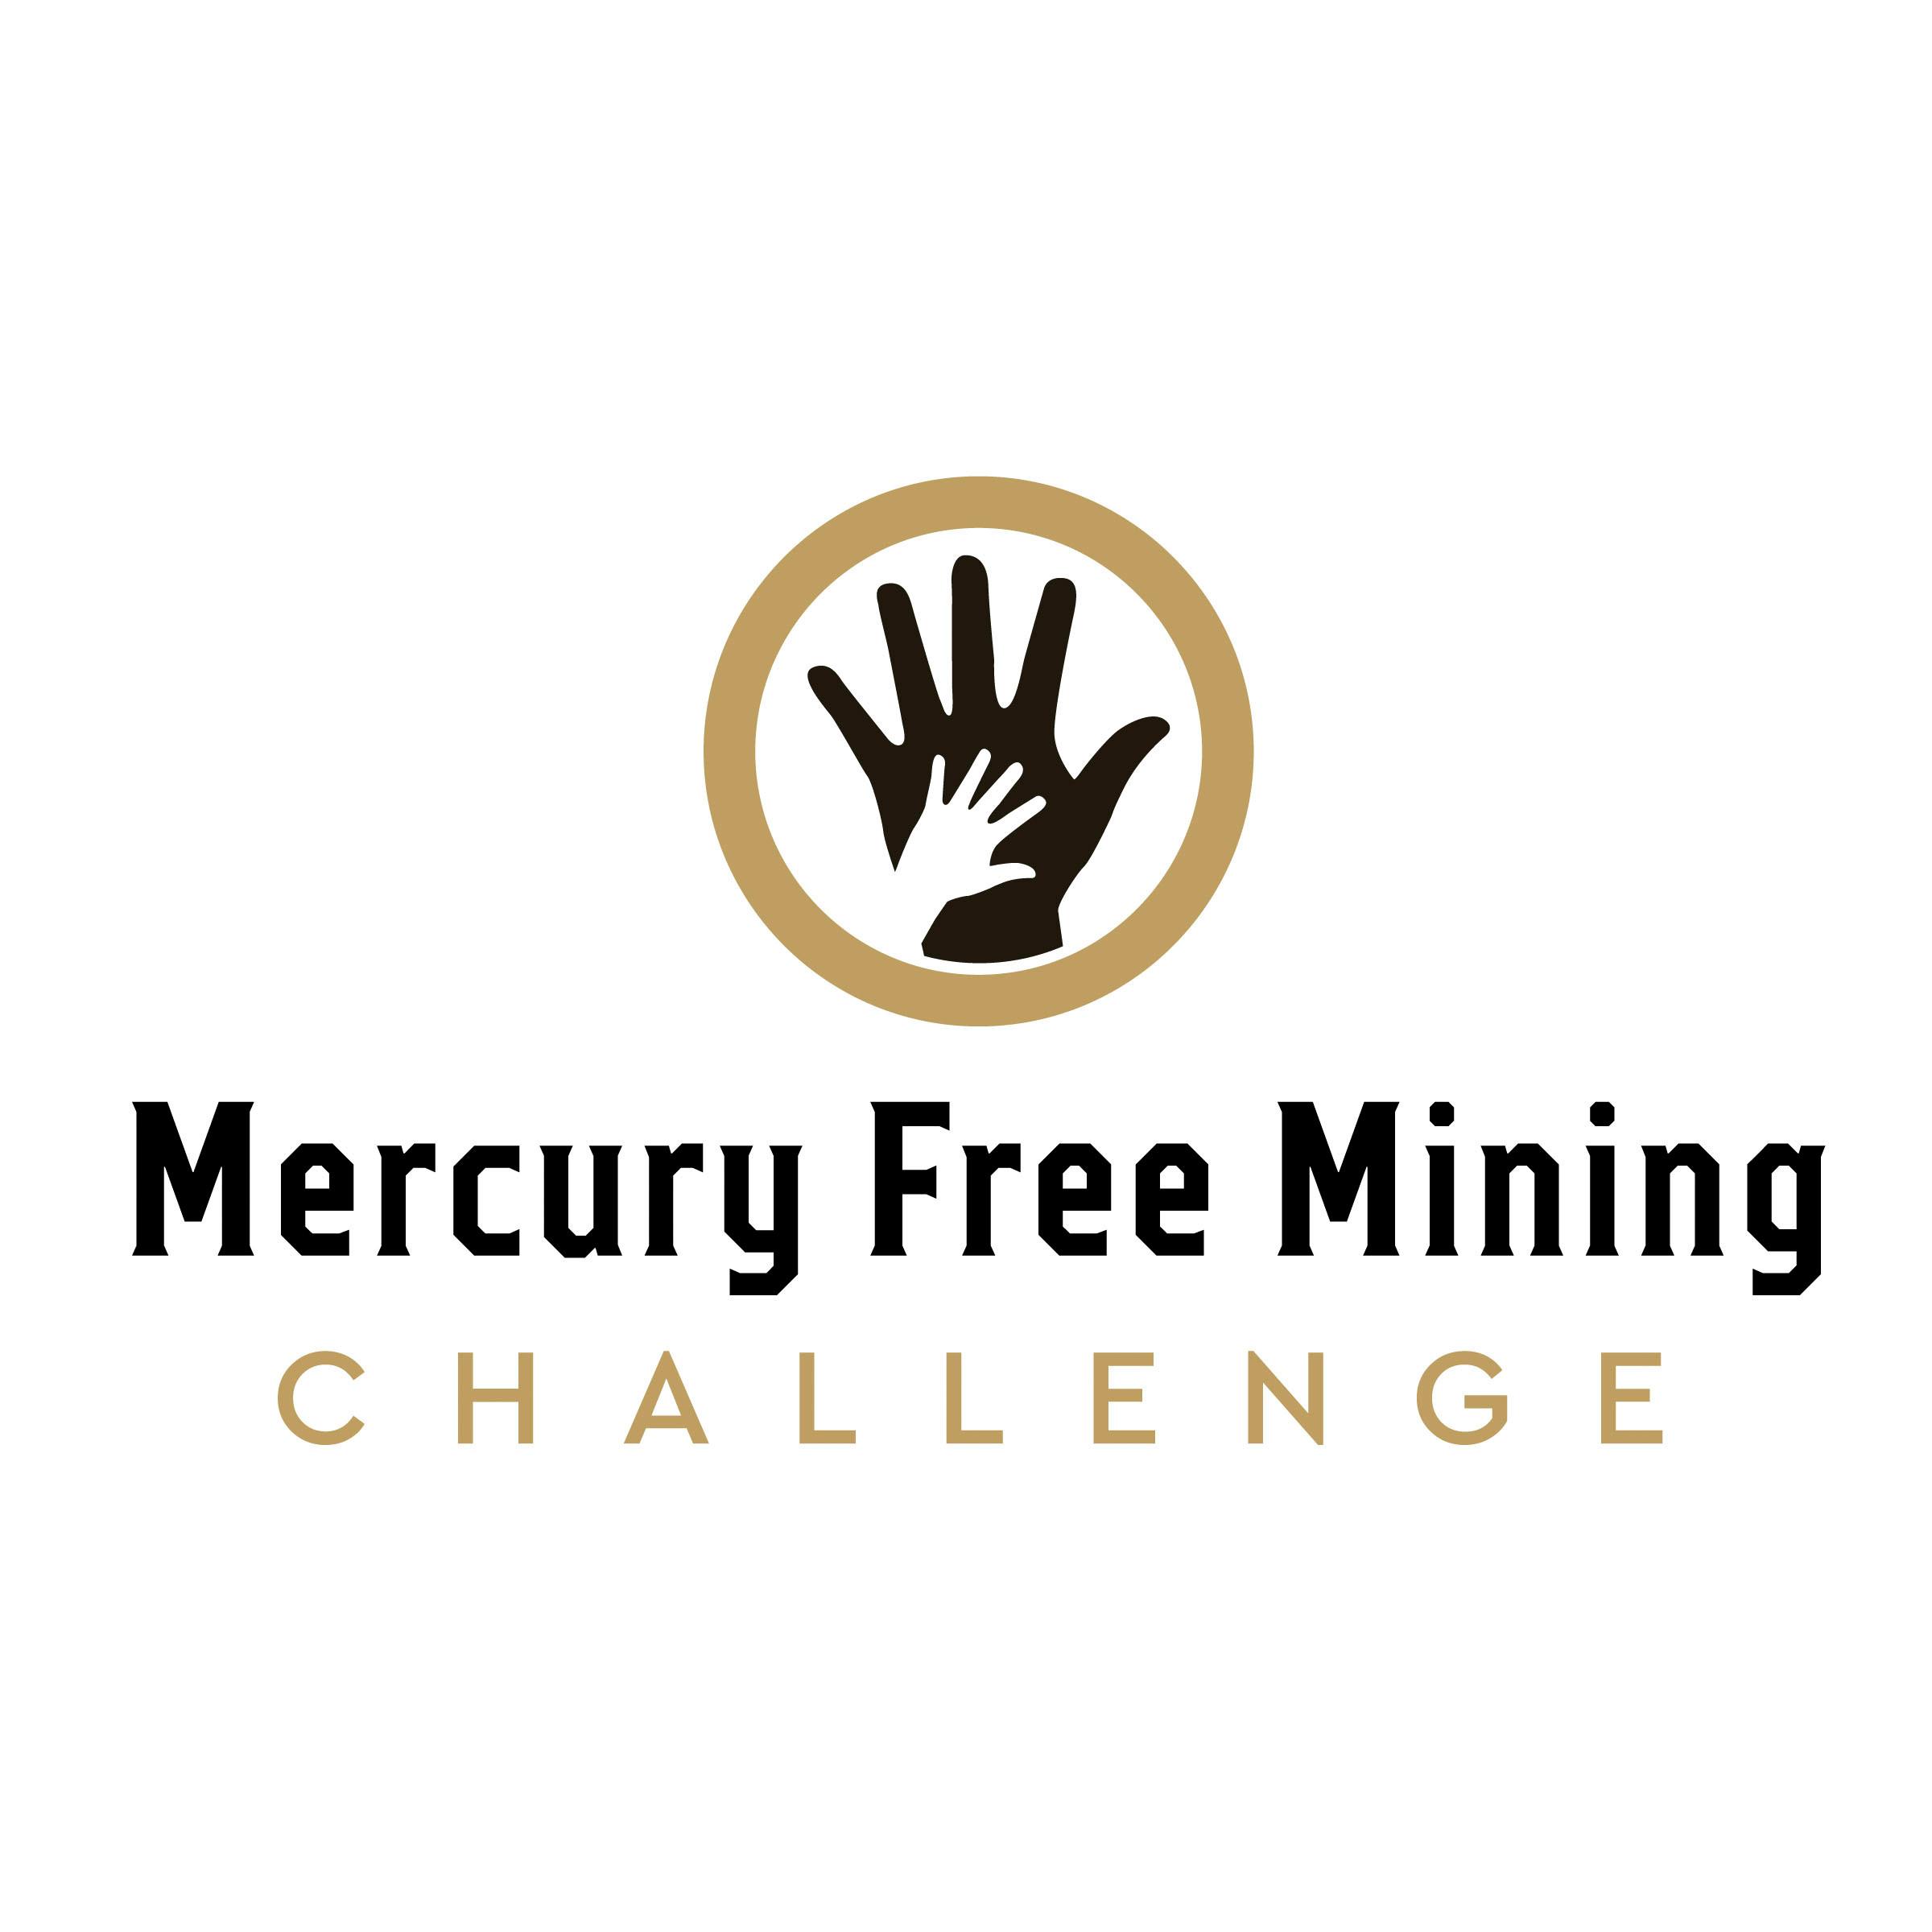 Mining Challenges: Mercury Free Mining Challenge I Fairmined I Anna Moltke